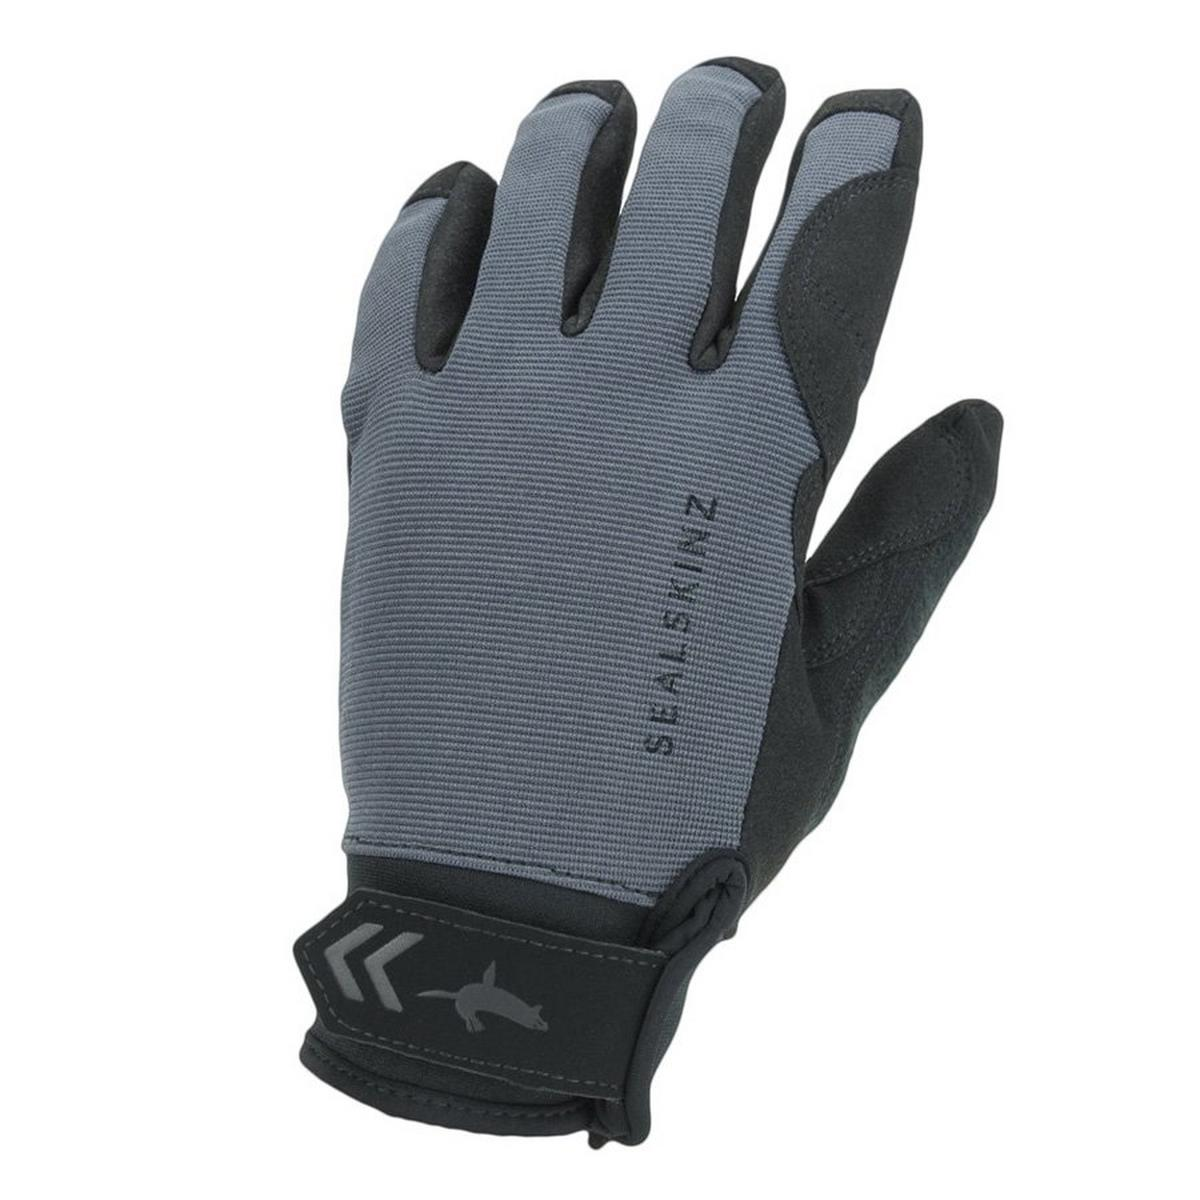 Sealskinz Unisex Sealskinz Waterproof All Weather Glove - Grey